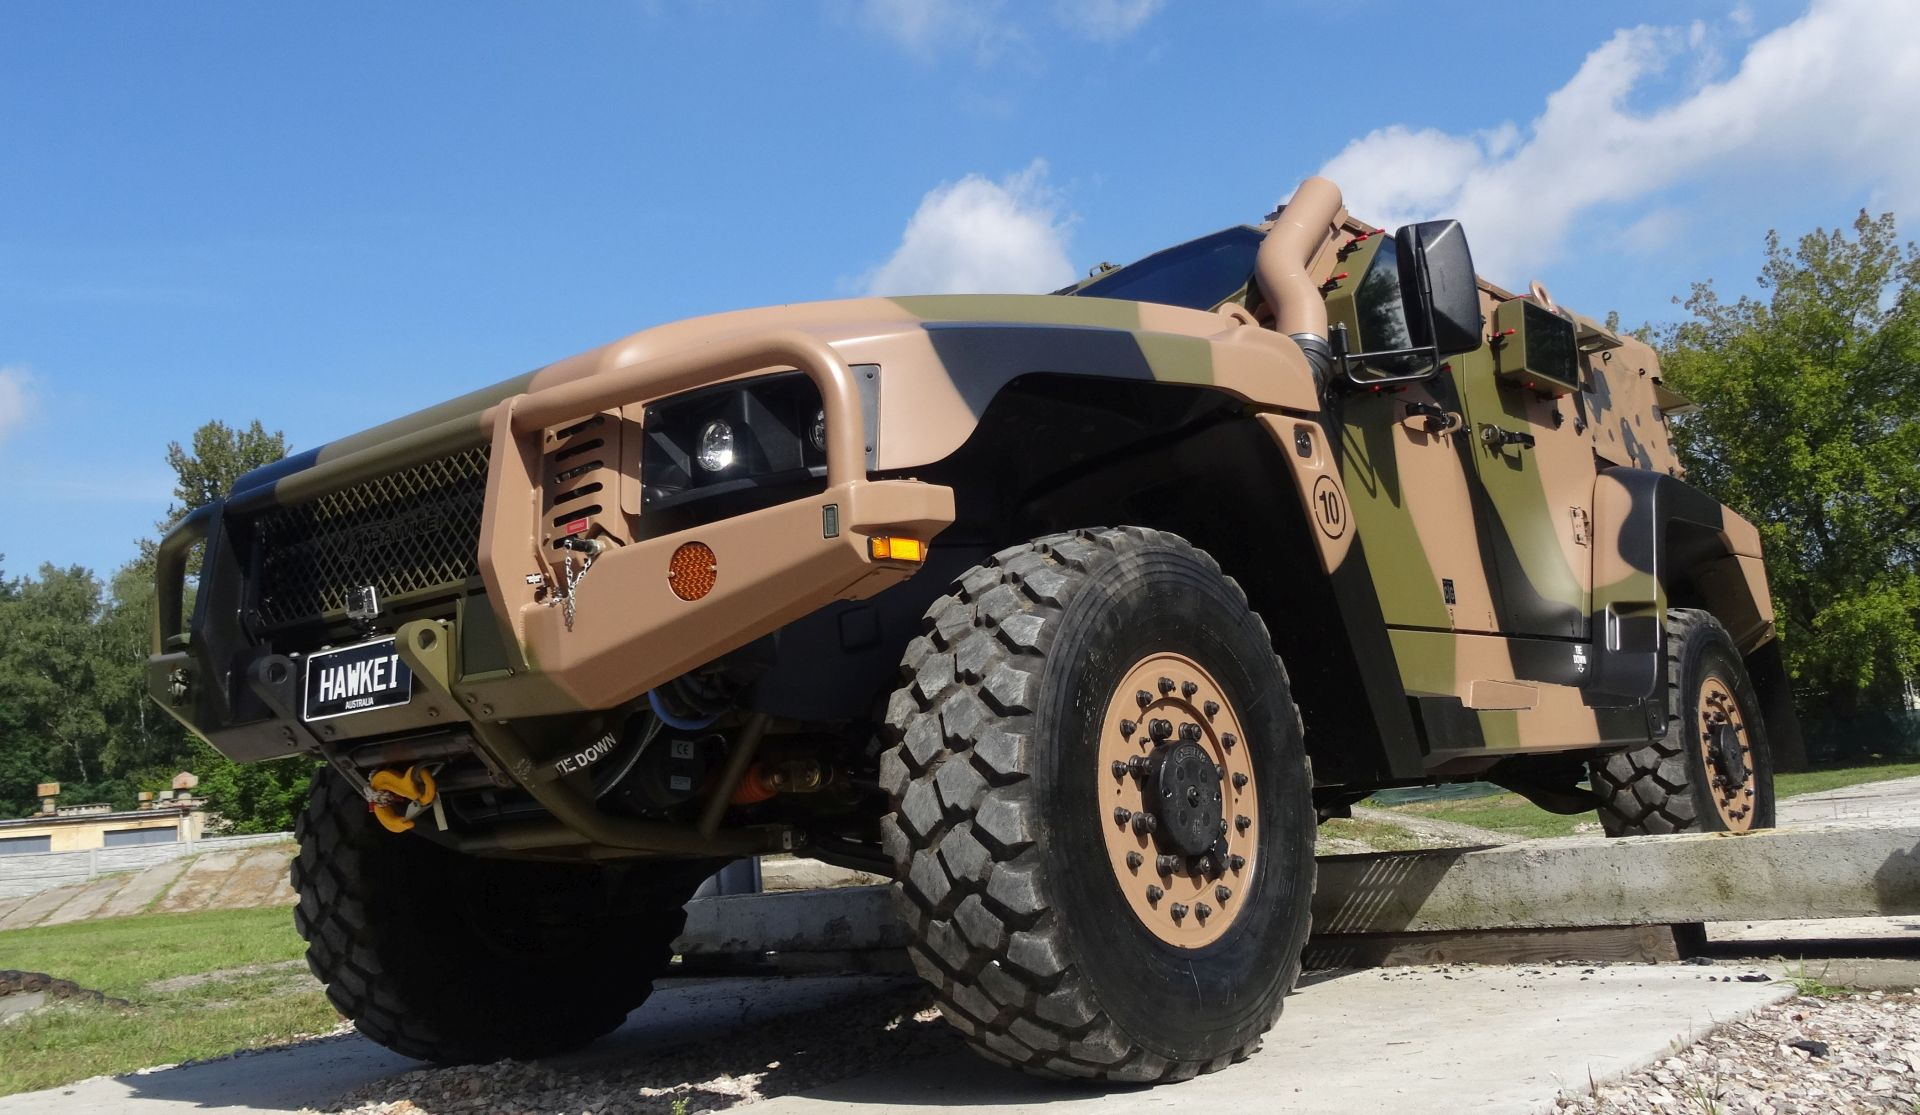 Hawkei Armored Vehicle